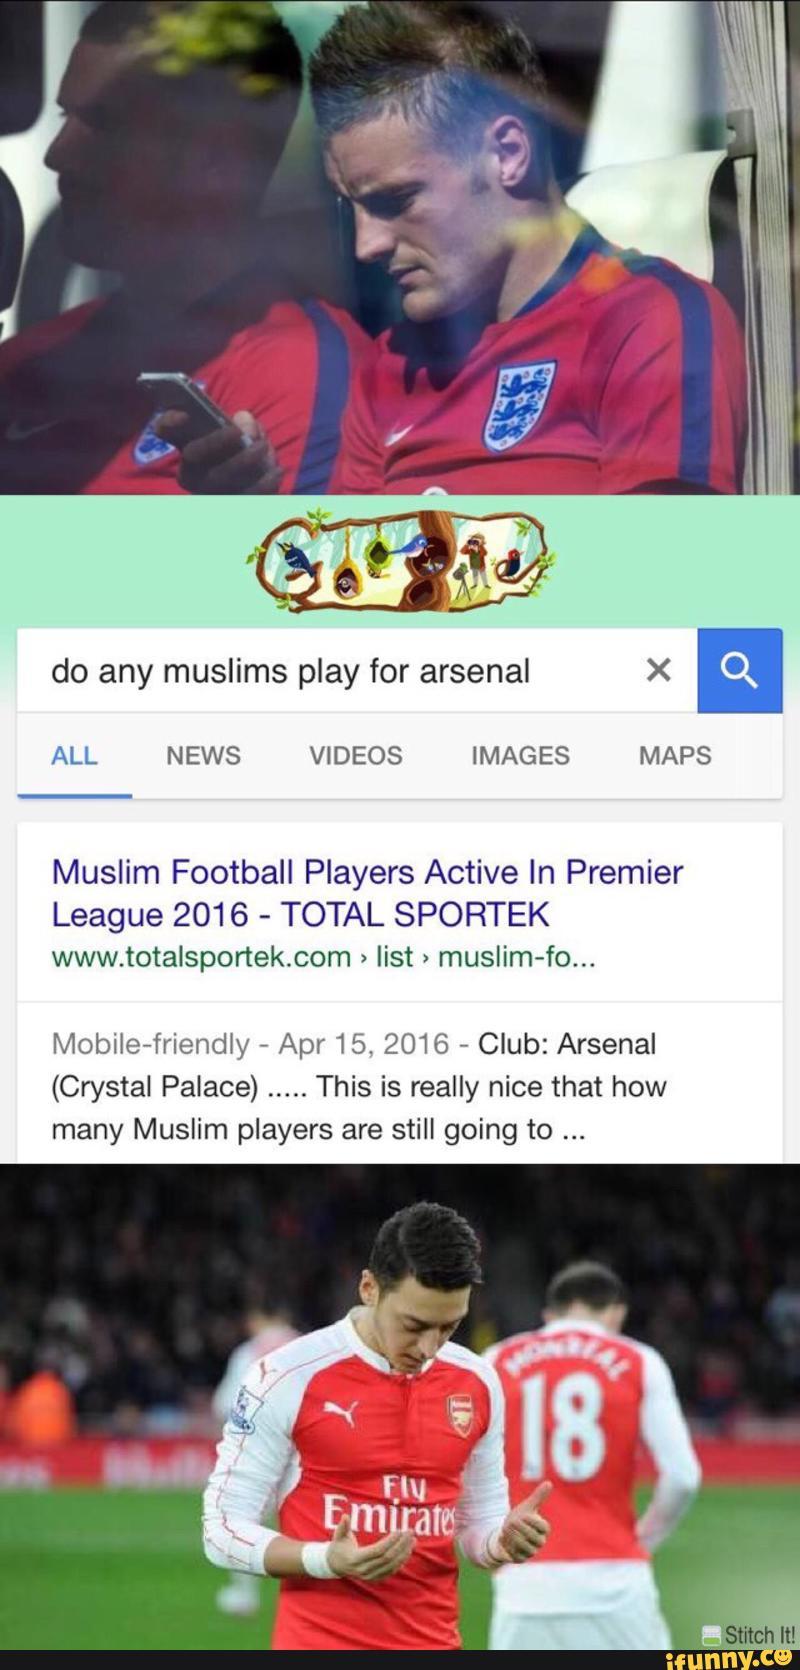 Do Any Muslims Play For Arsenal X ª All News Videos Images Maps Muslim Football Players Active In Premier League 2016 Total Sportek Www Totalsportek Com List Muslim Fo Mobiie Friendw Apr Проверка текущего статуса totalsportek уже запущена. ifunny